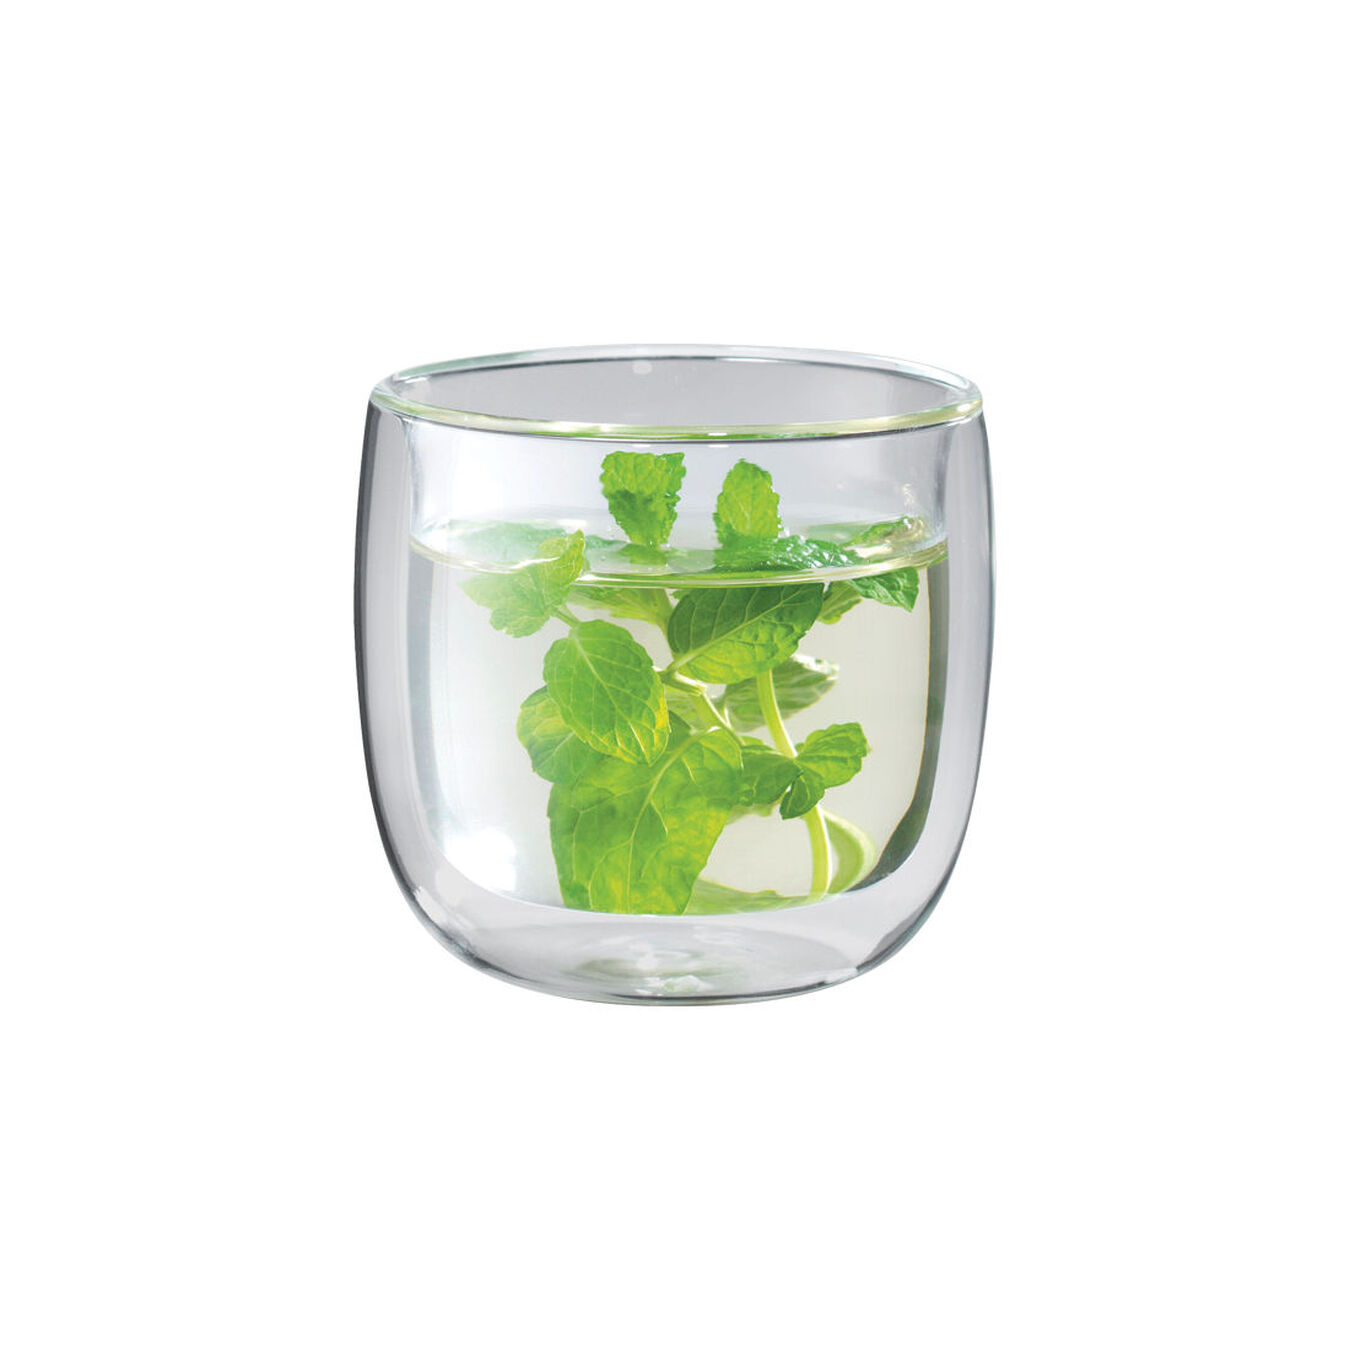 2-pc Tea glass set, Double wall ,,large 1